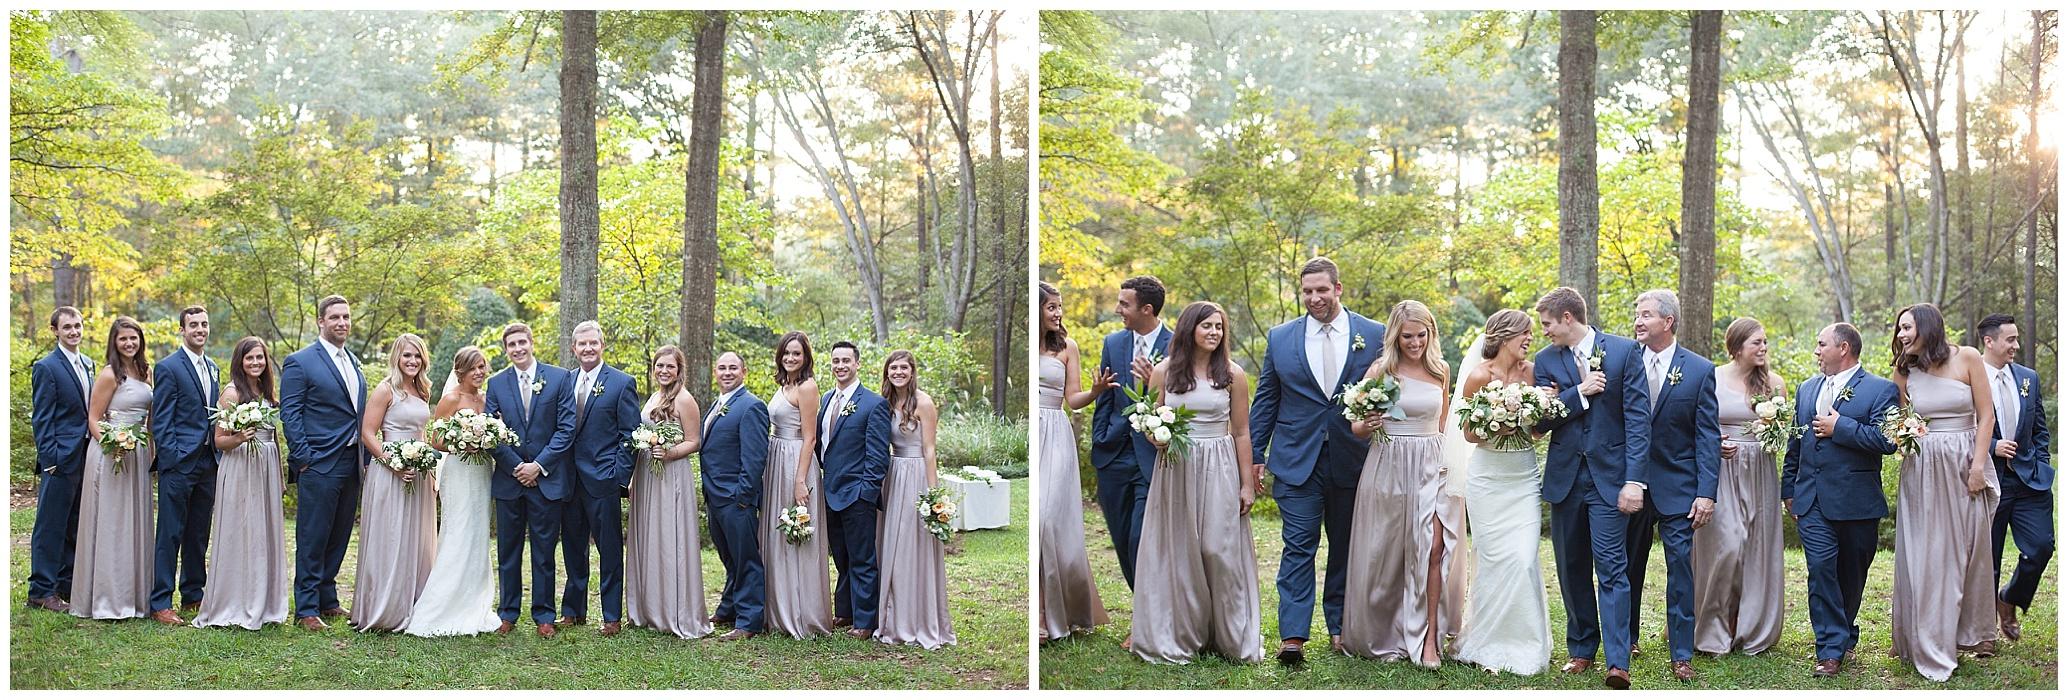 The Stuckeys 09-06-2015-2598.jpg